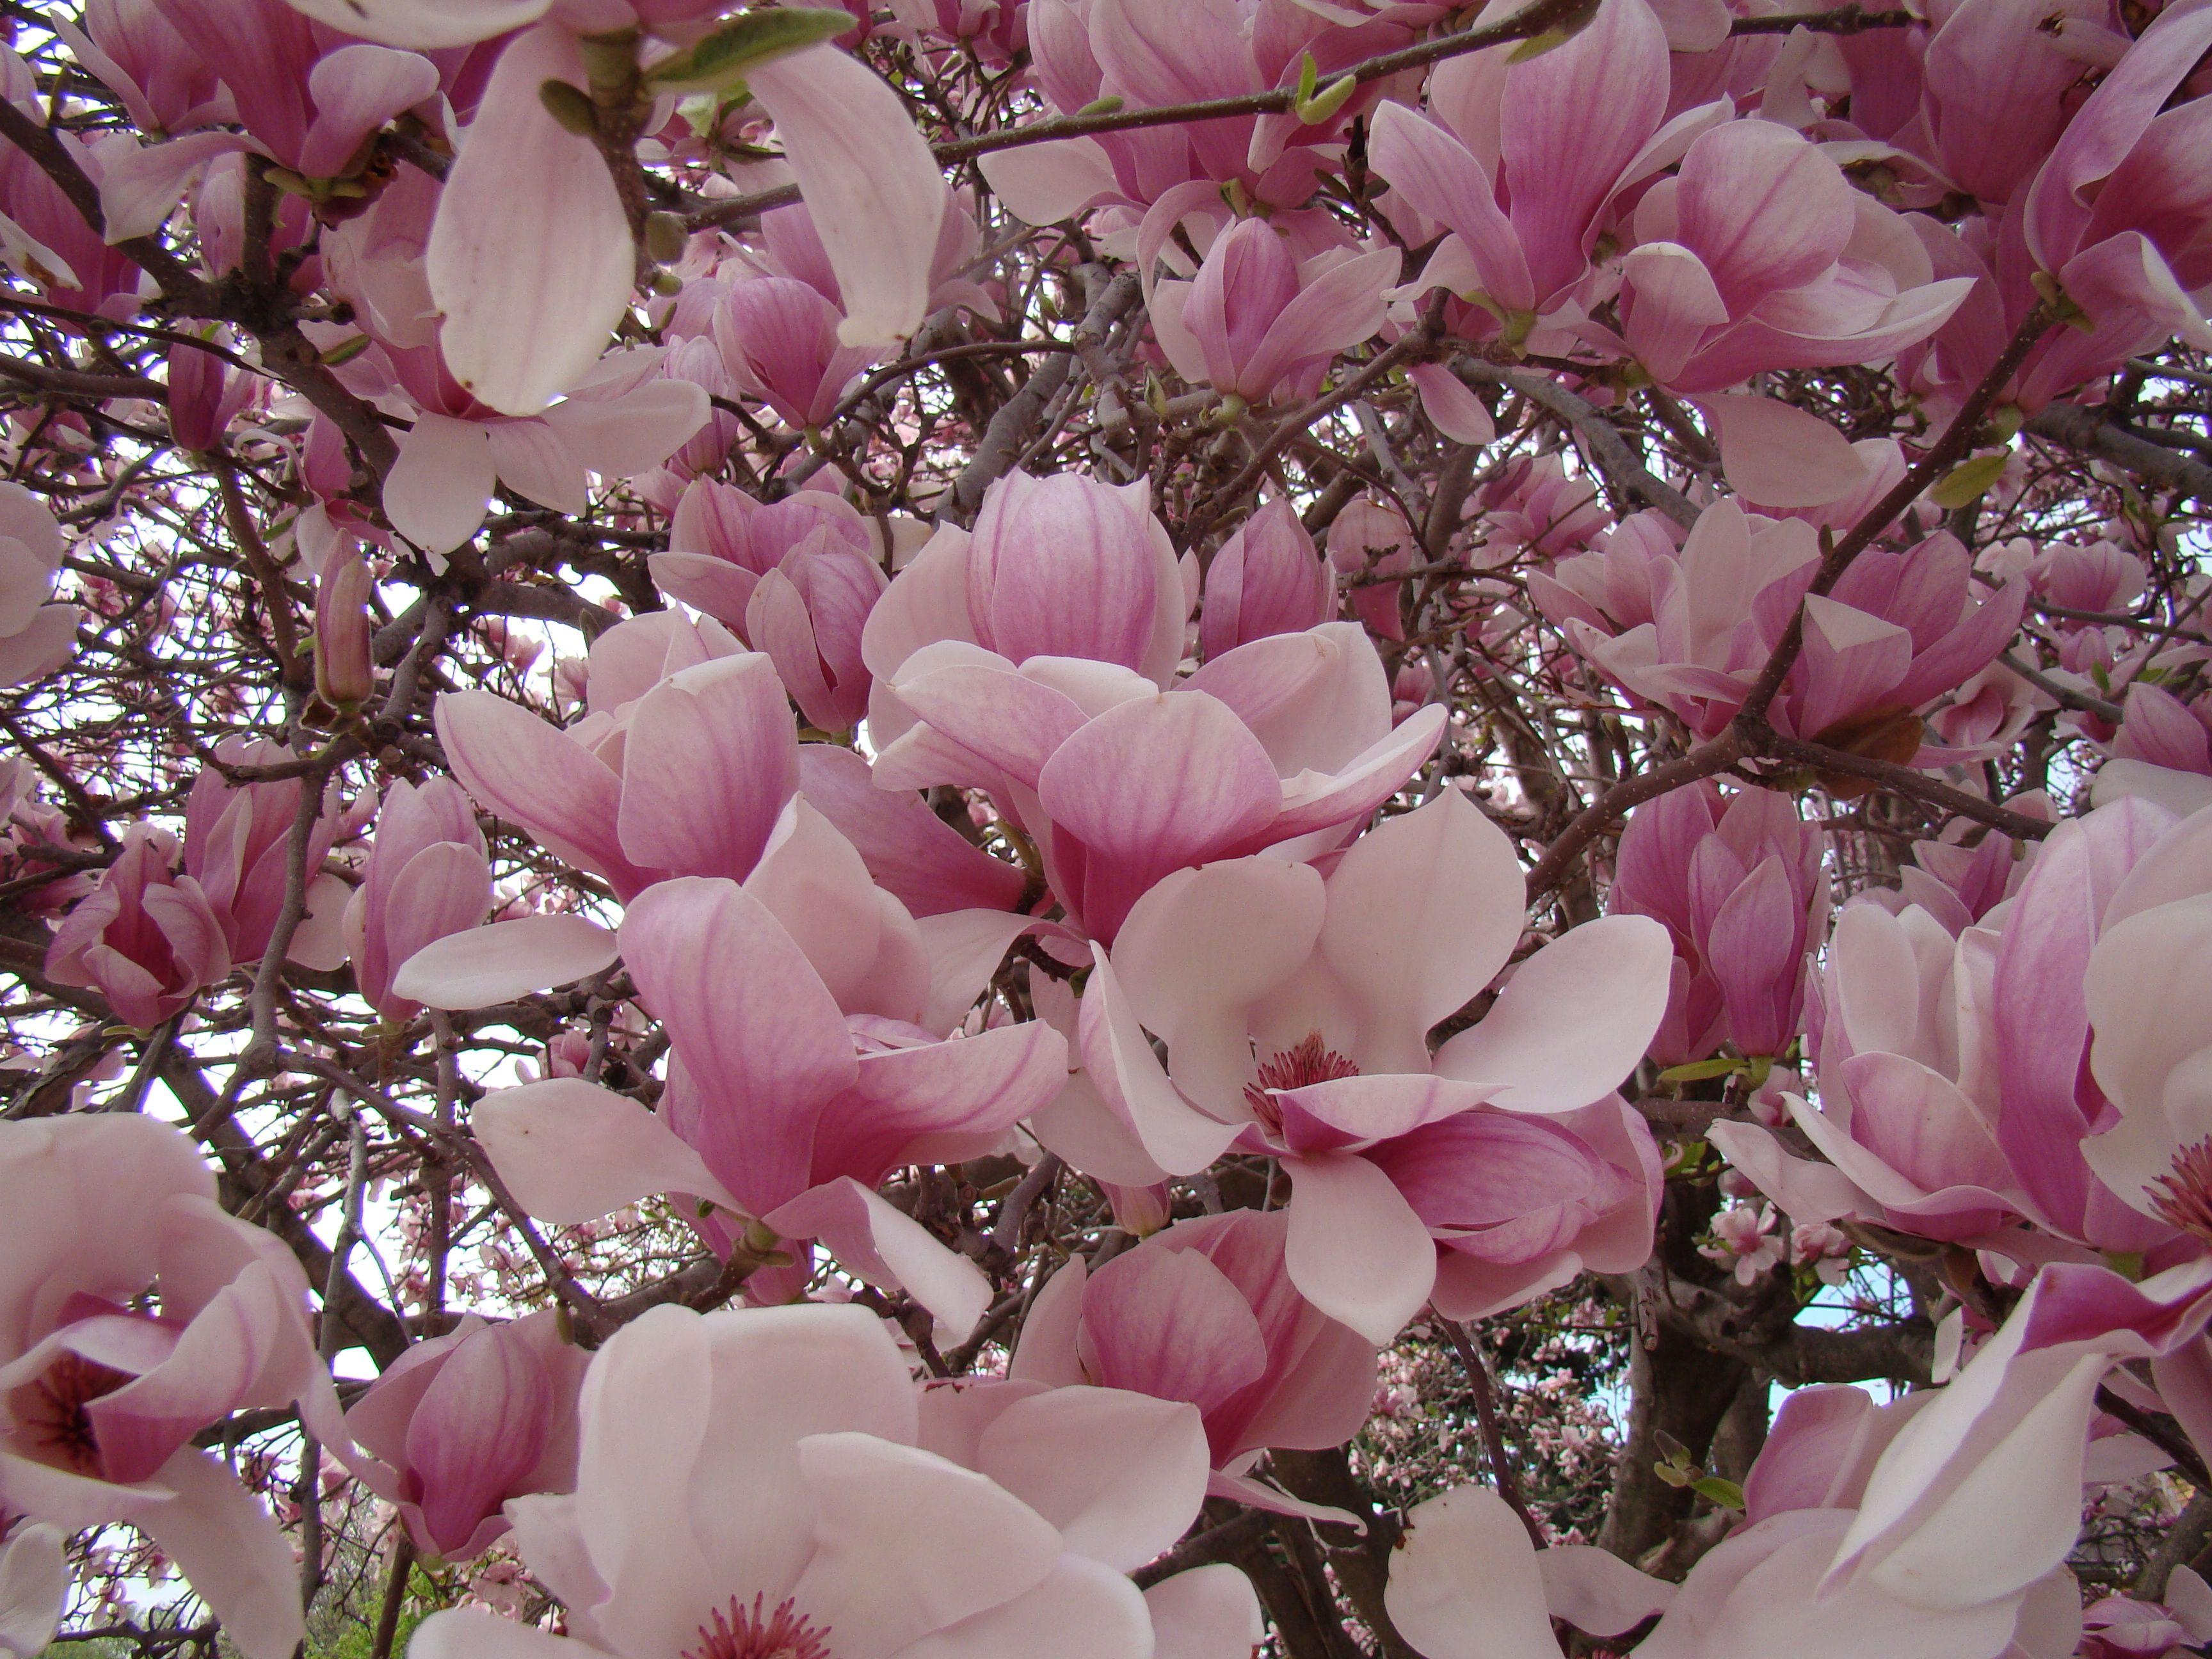 Jane Magnolia Saucer Magnolia Tree Magnolia Trees Fragrant Plant